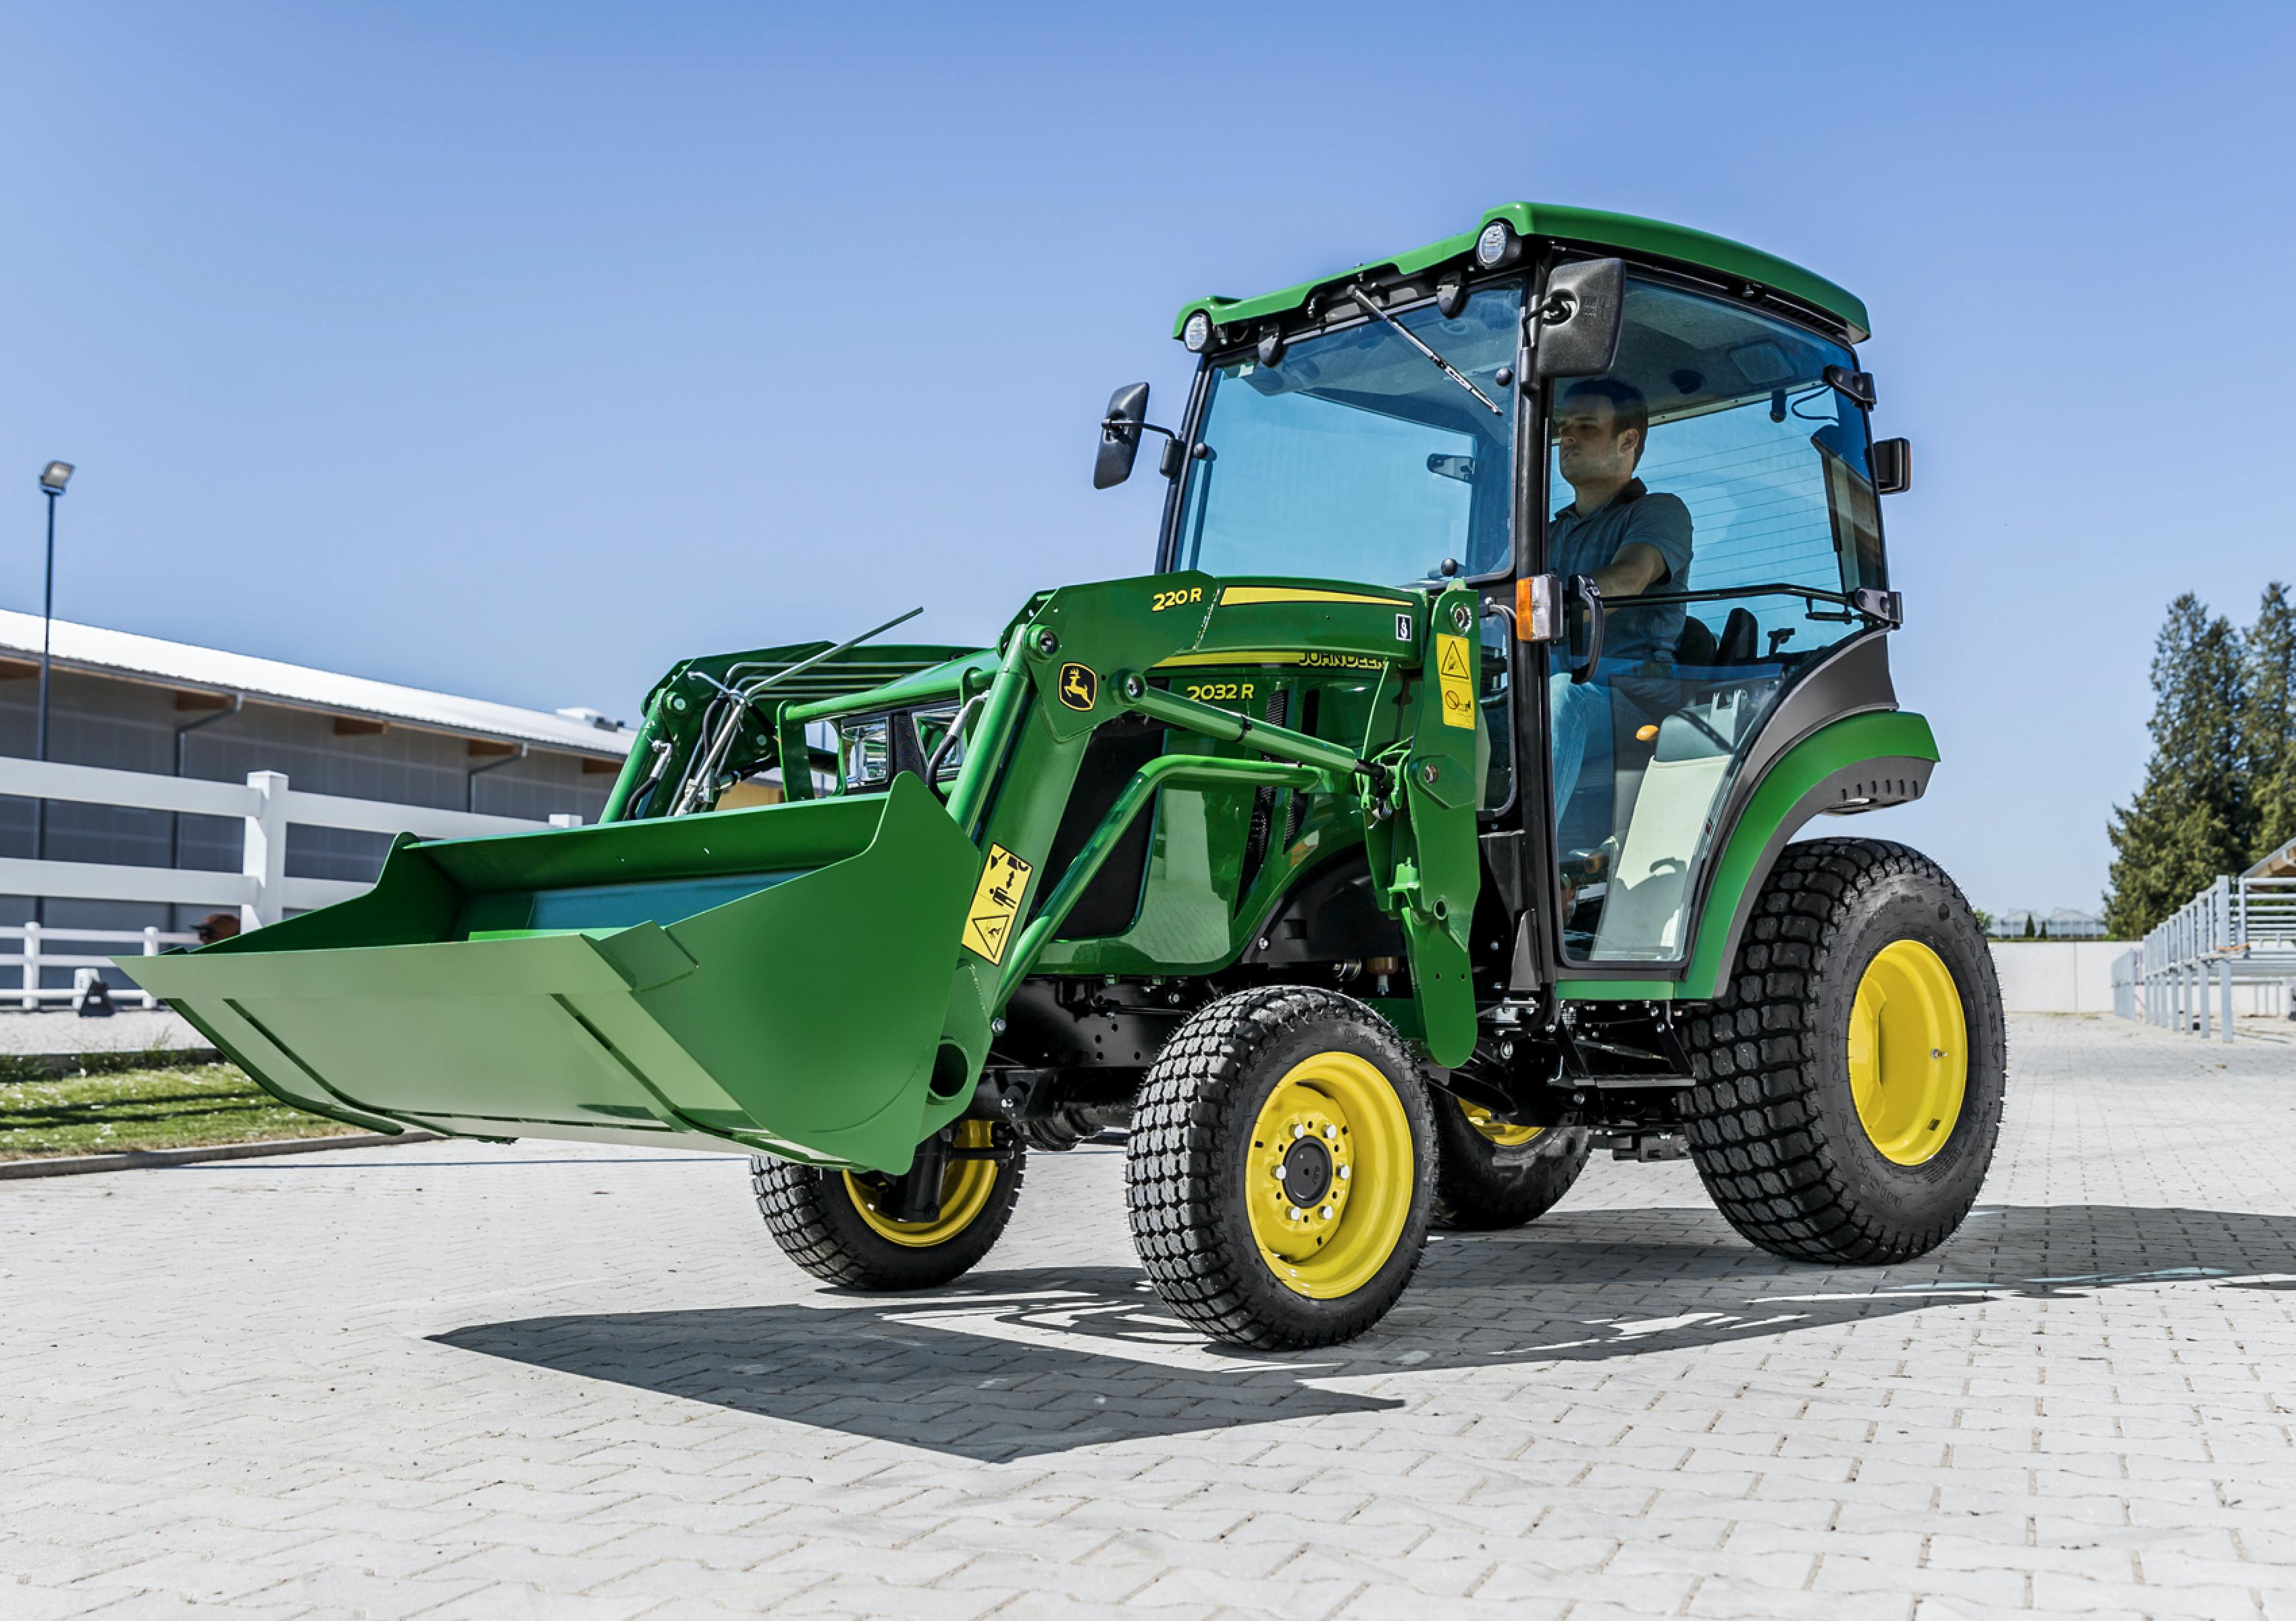 John Deere updates compact tractor range | Industrial Vehicle Technology International